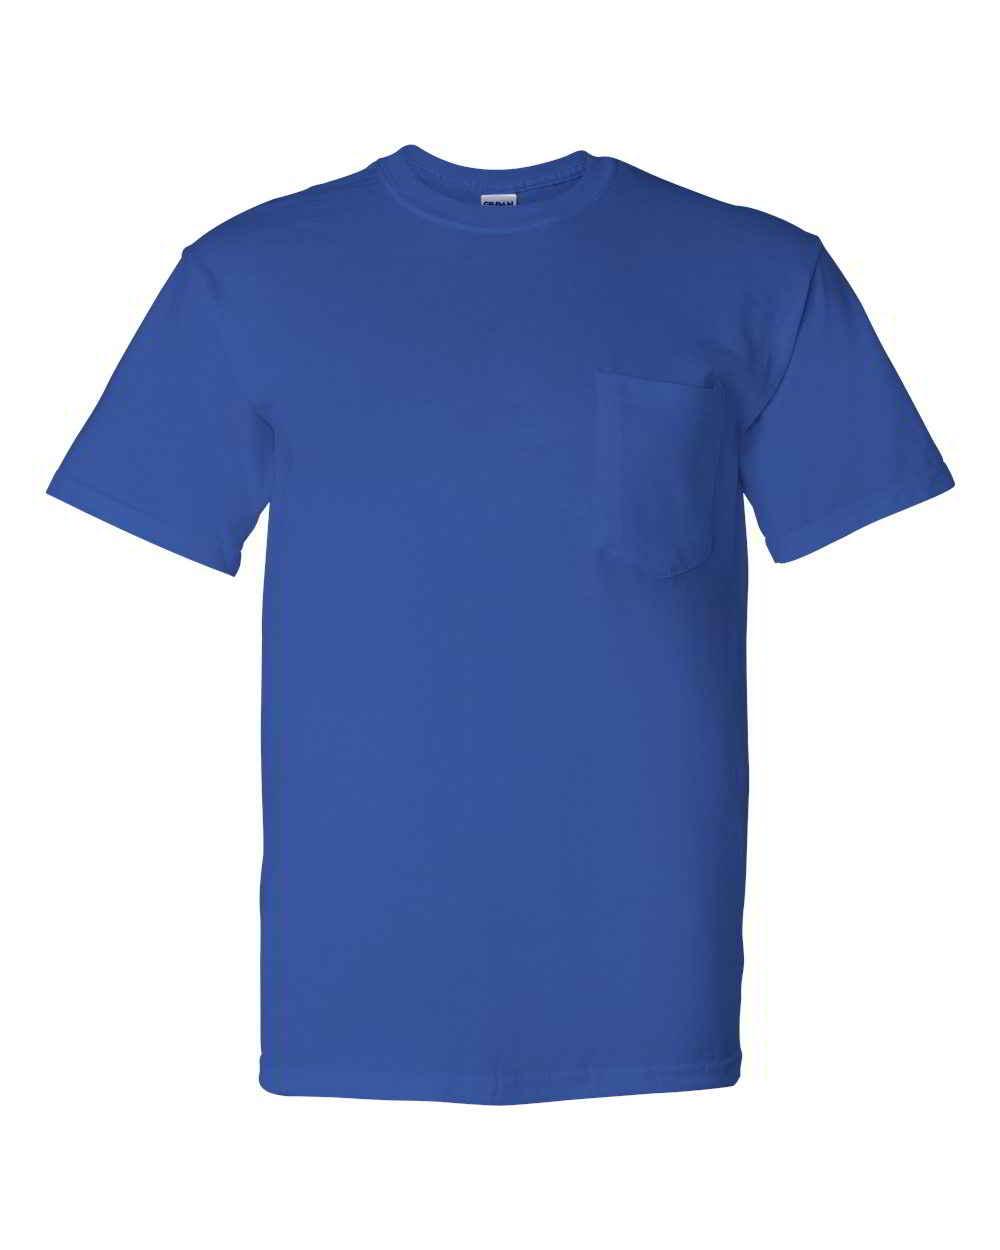 Gildan-DryBlend-Mens-50-50-Short-Sleeve-Tees-T-Shirt-with-a-Pocket thumbnail 11